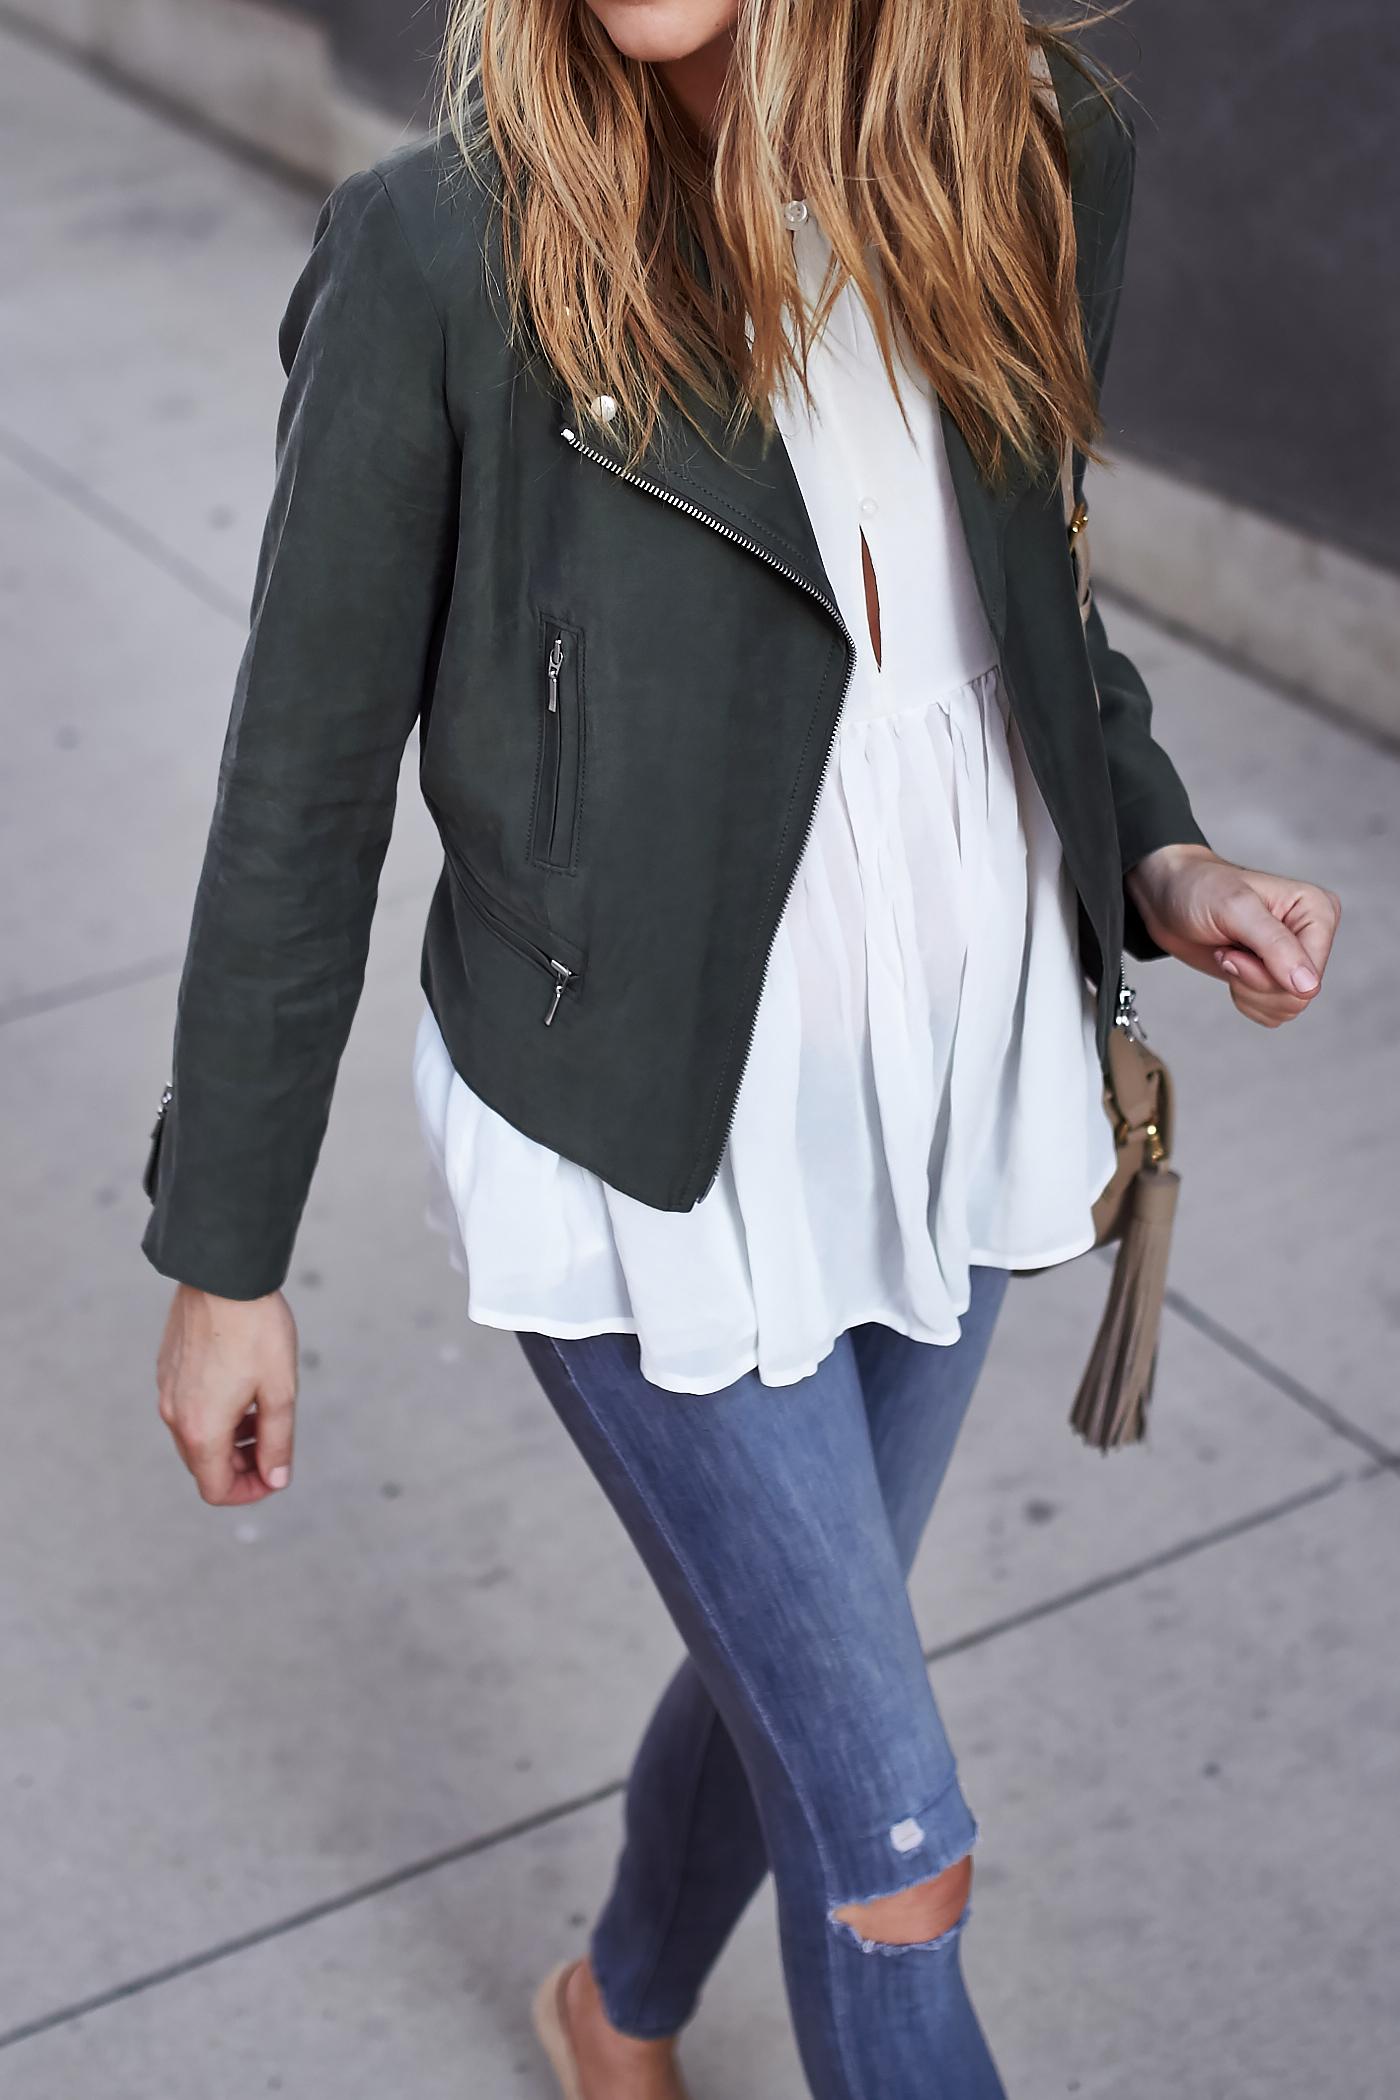 fashion-jackson-club-monaco-kapri-moto-jacket-ripped-denim-skinny-jeans-sincereley-jules-cameron-blouse